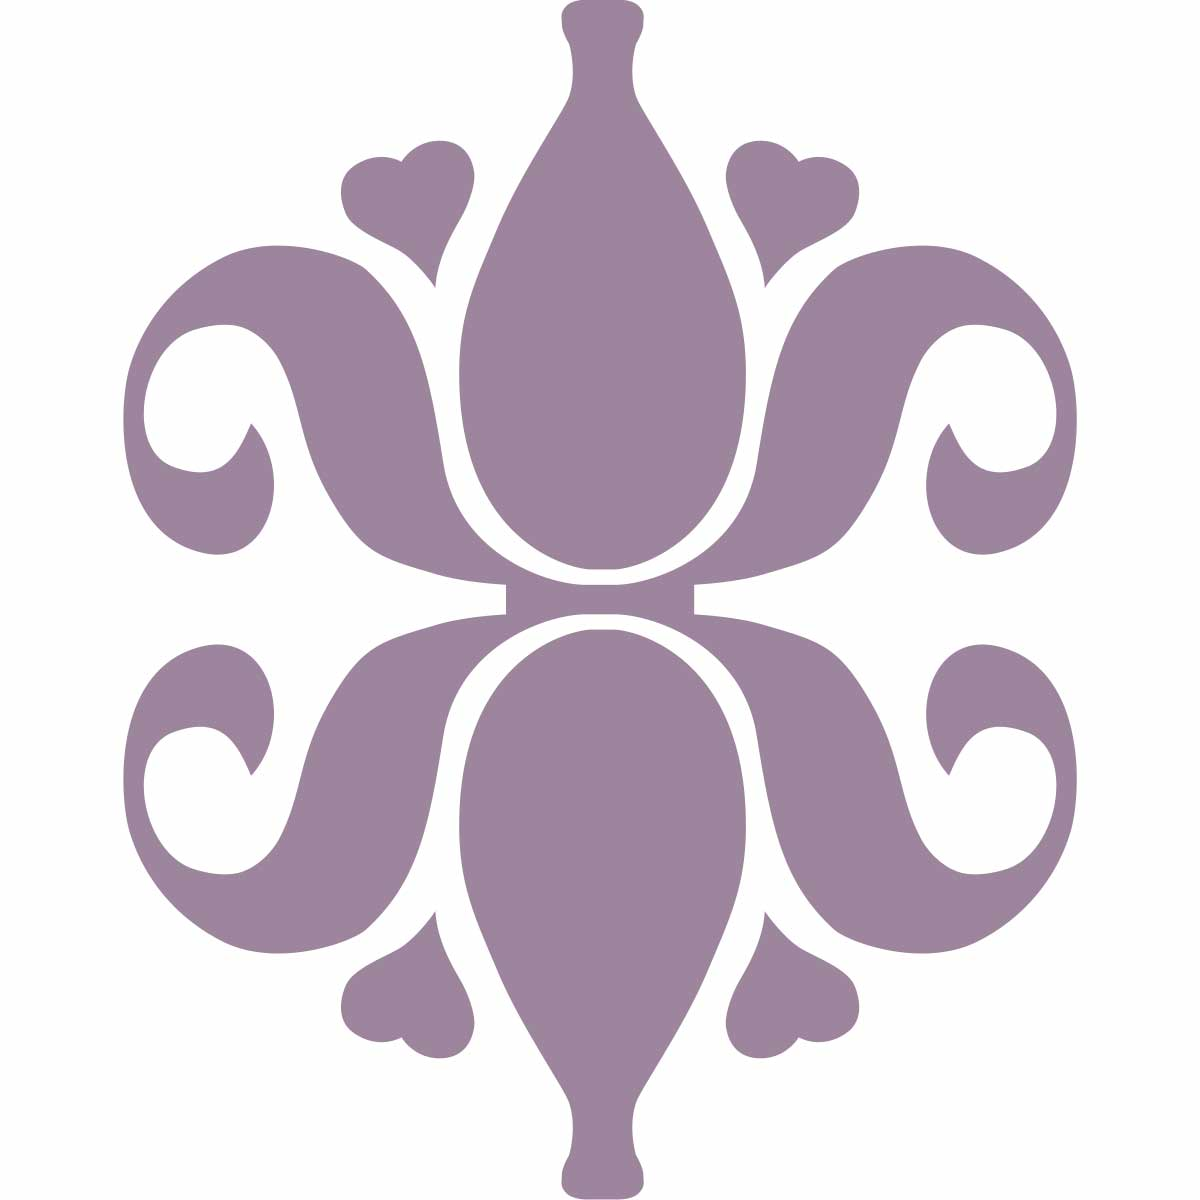 FolkArt ® Acrylic Colors - French Lilac, 2 oz.